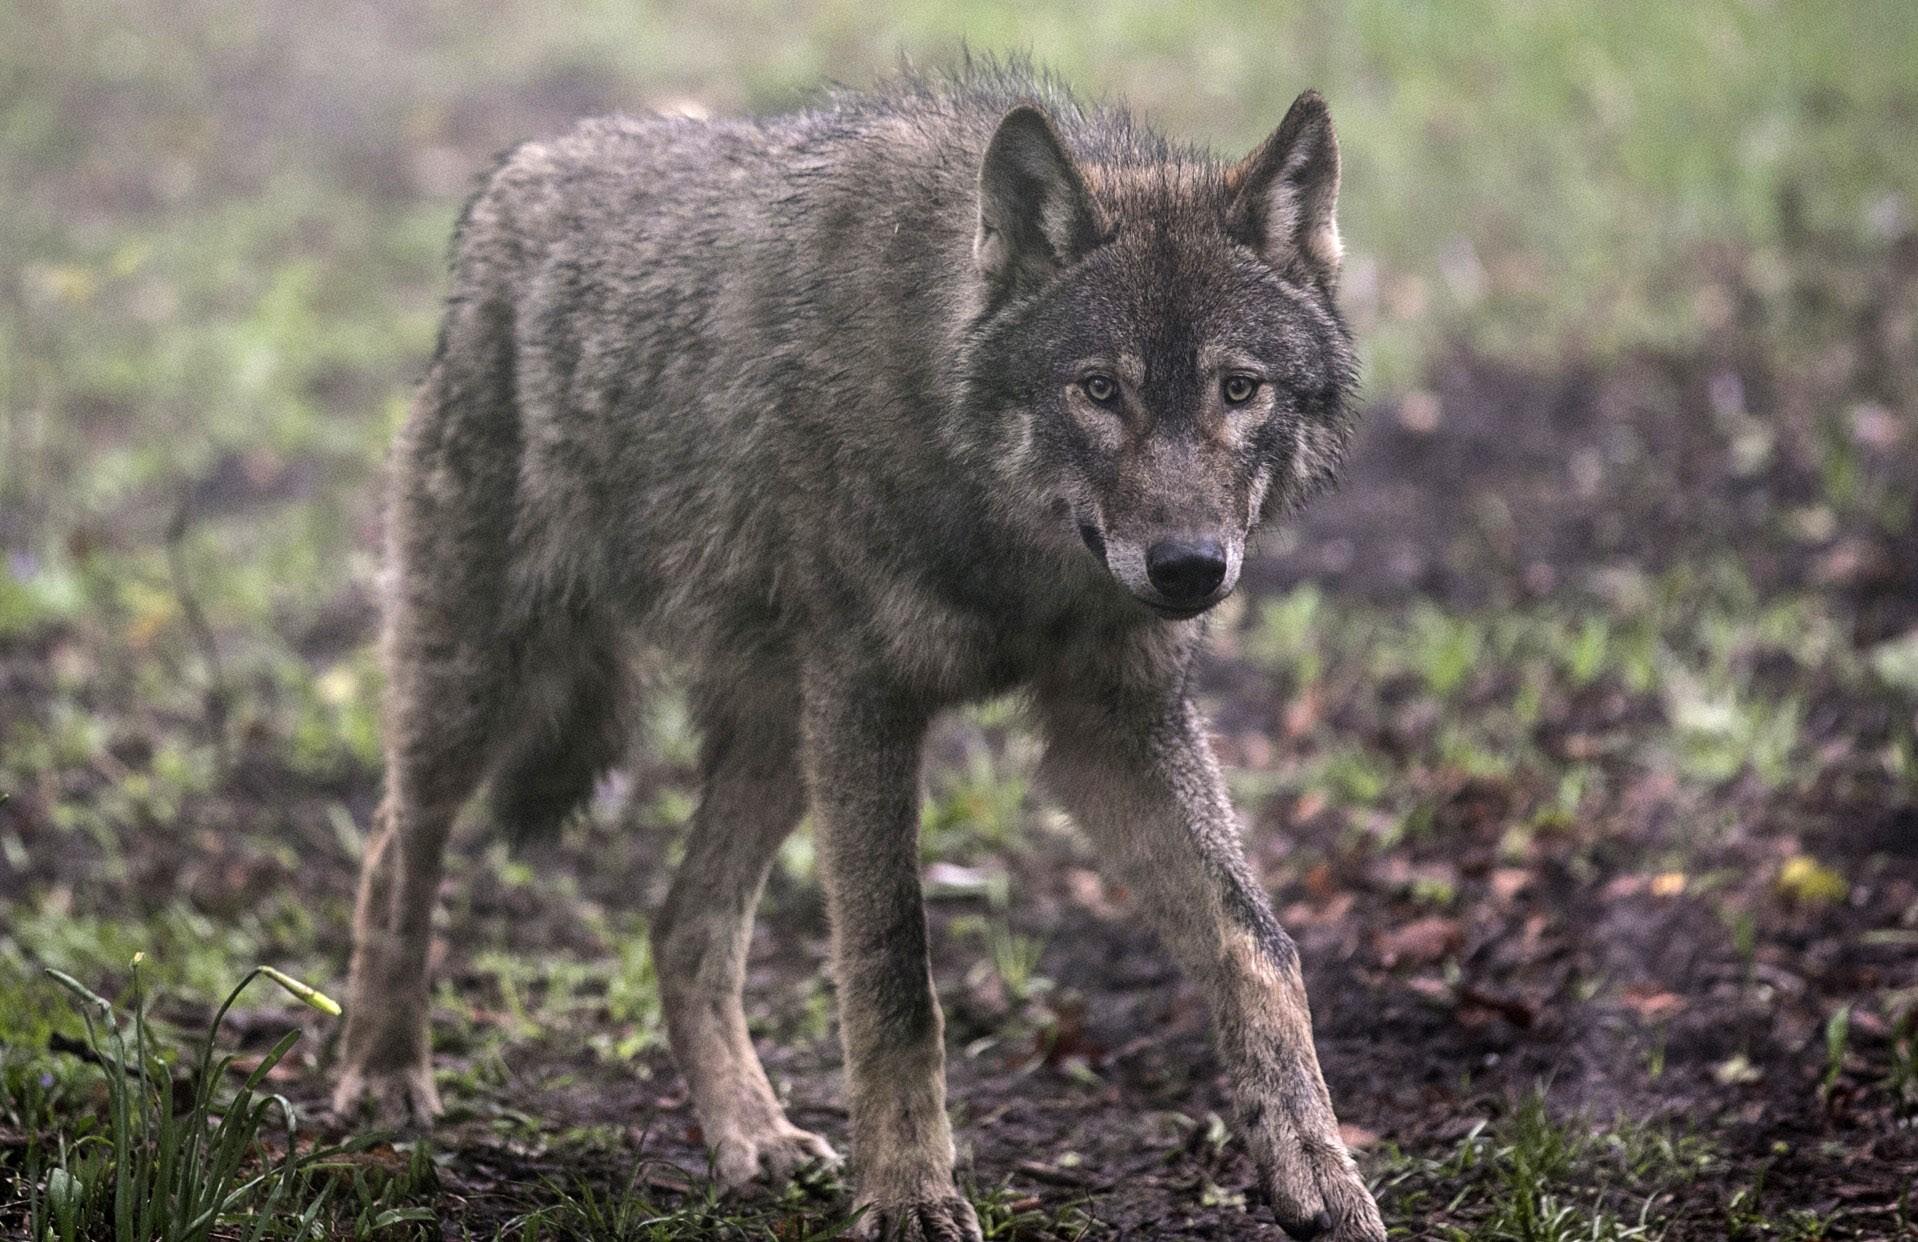 Um lobo na natureza (Foto: Getty Images)